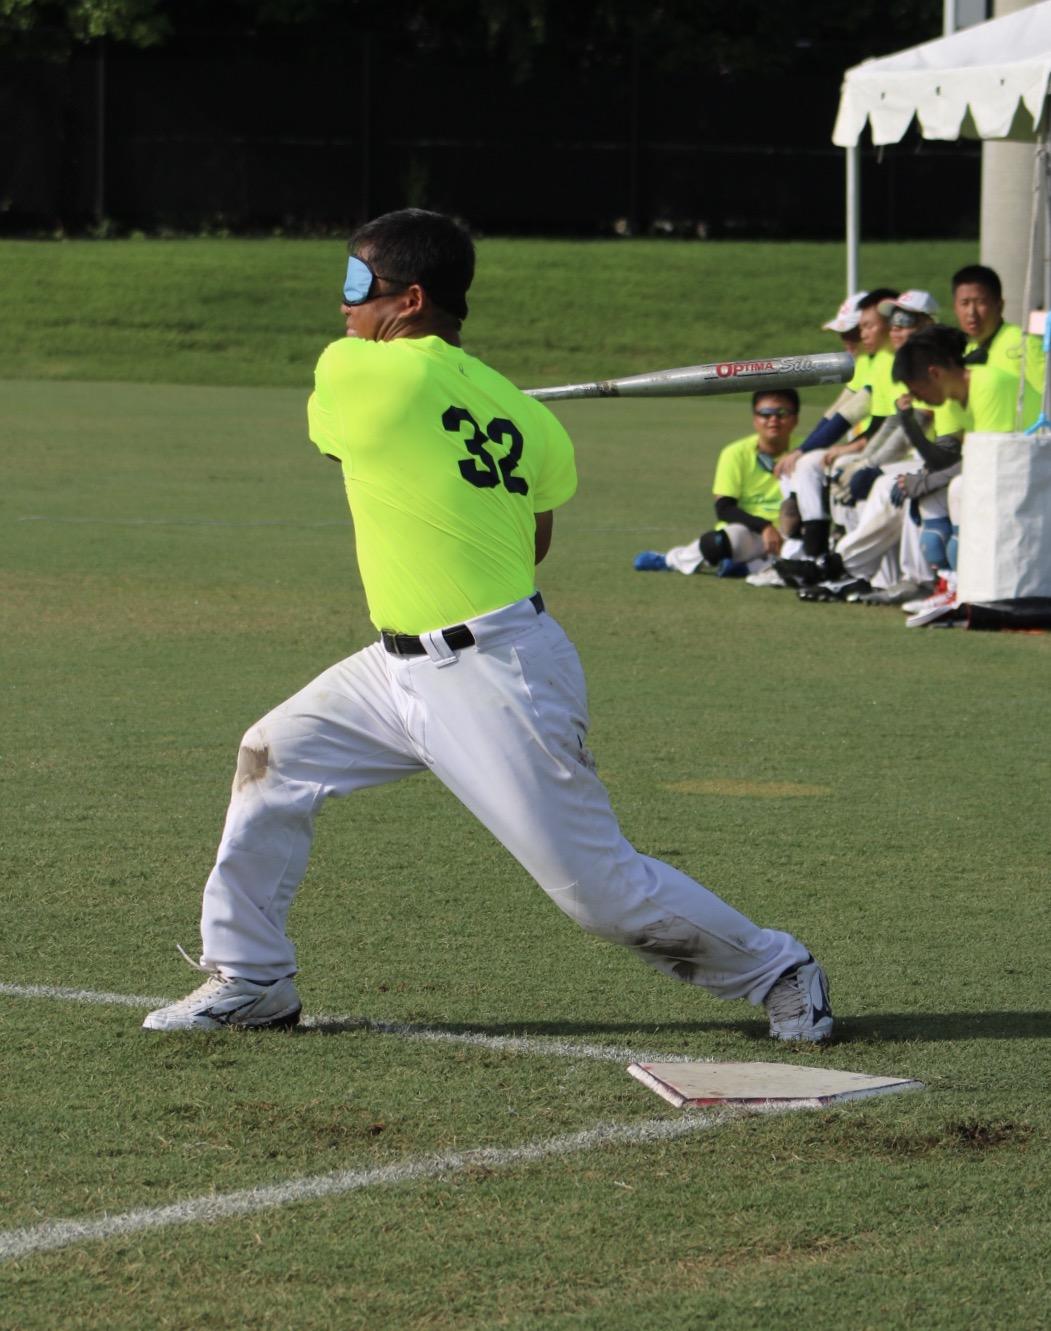 Taiwan Homerun's #32 swings the bat from home plate.